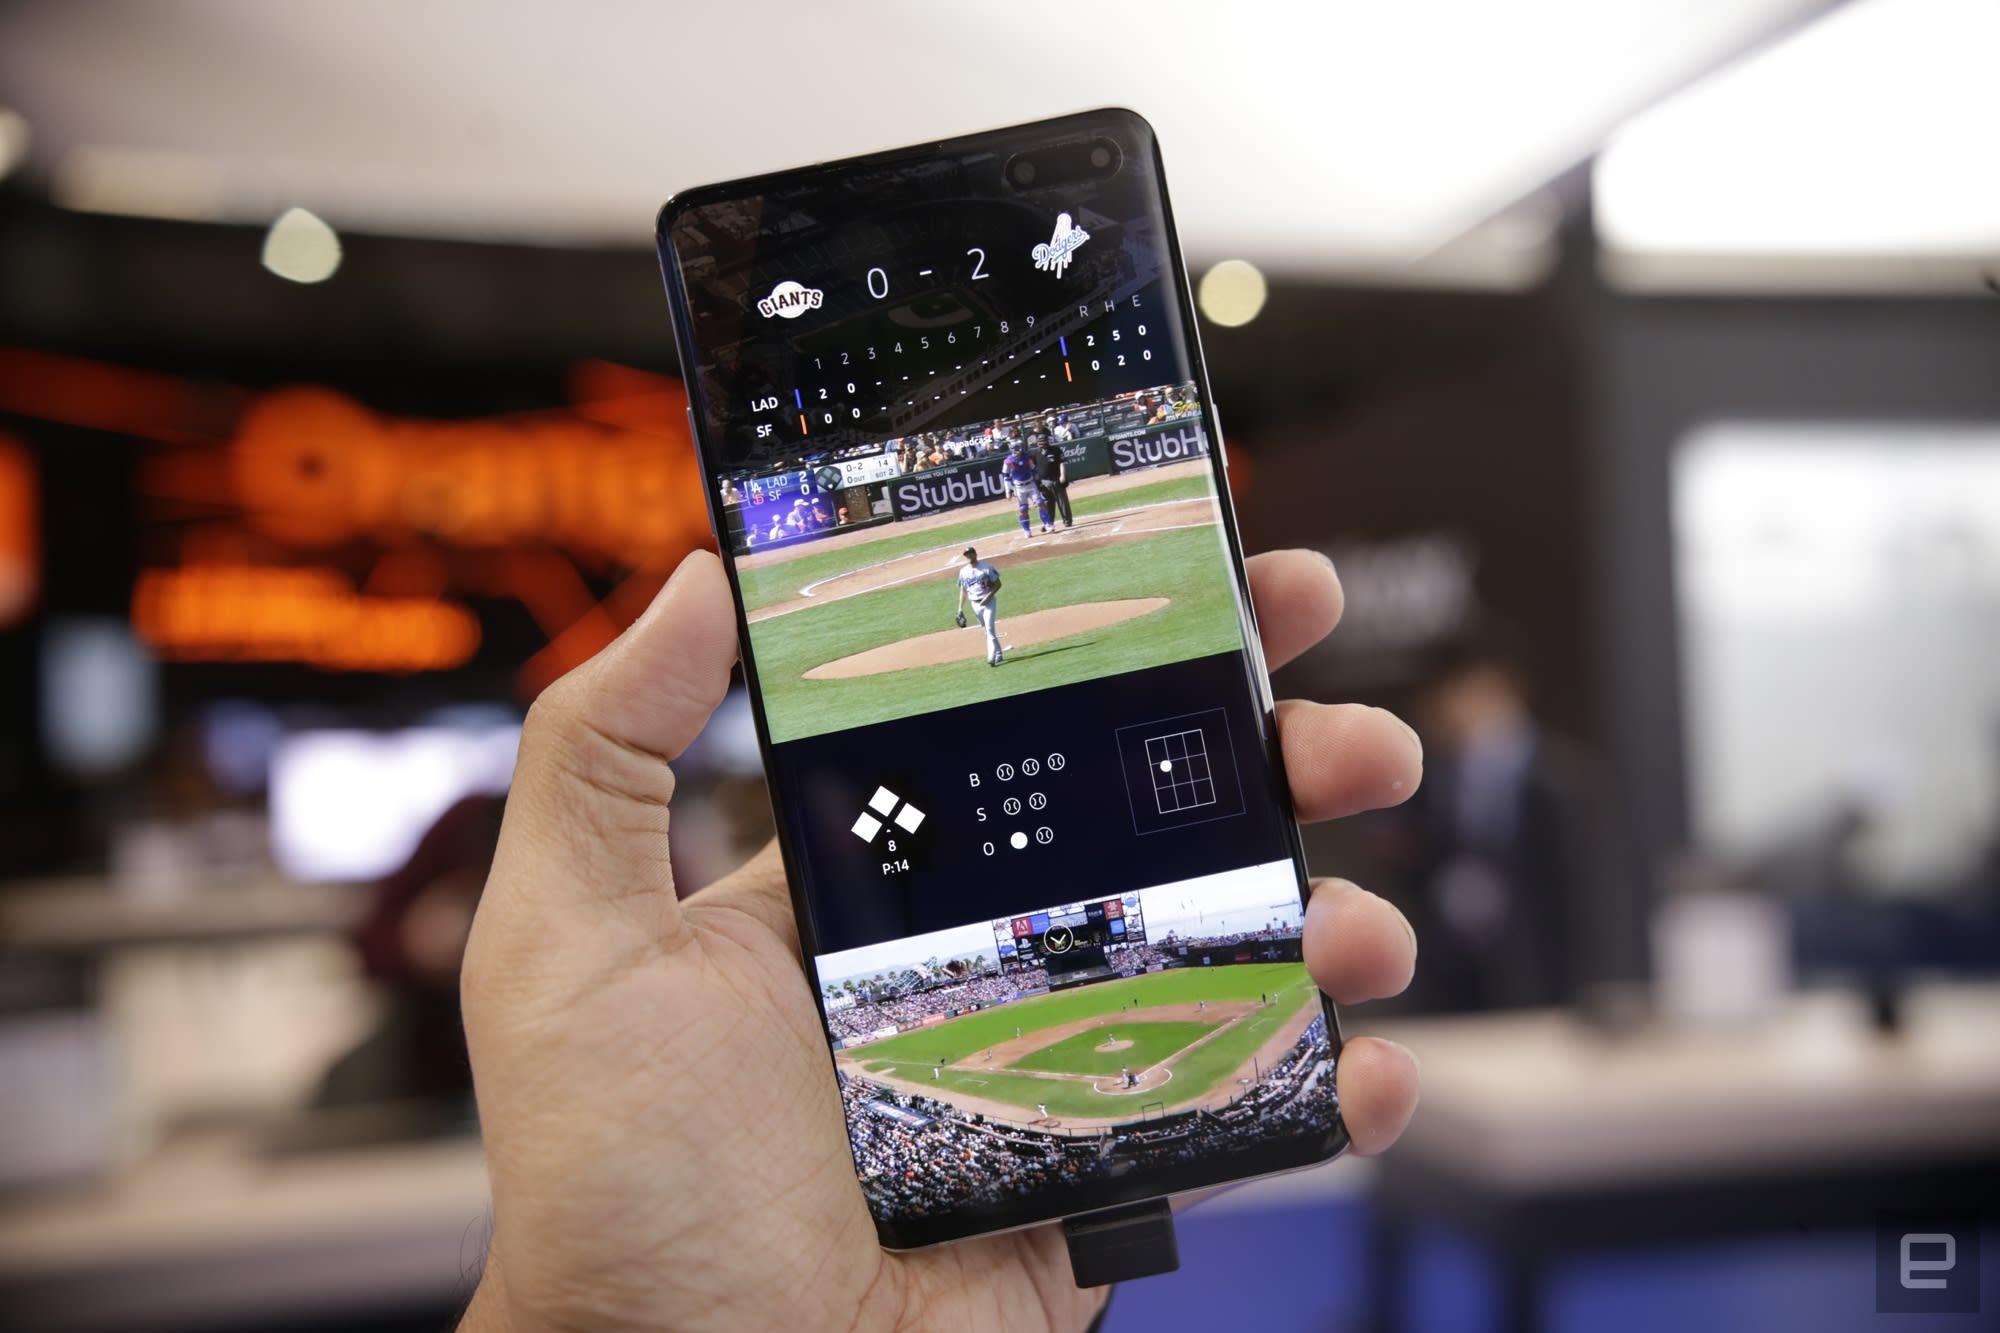 Samsung Galaxy S10 5G hands-on